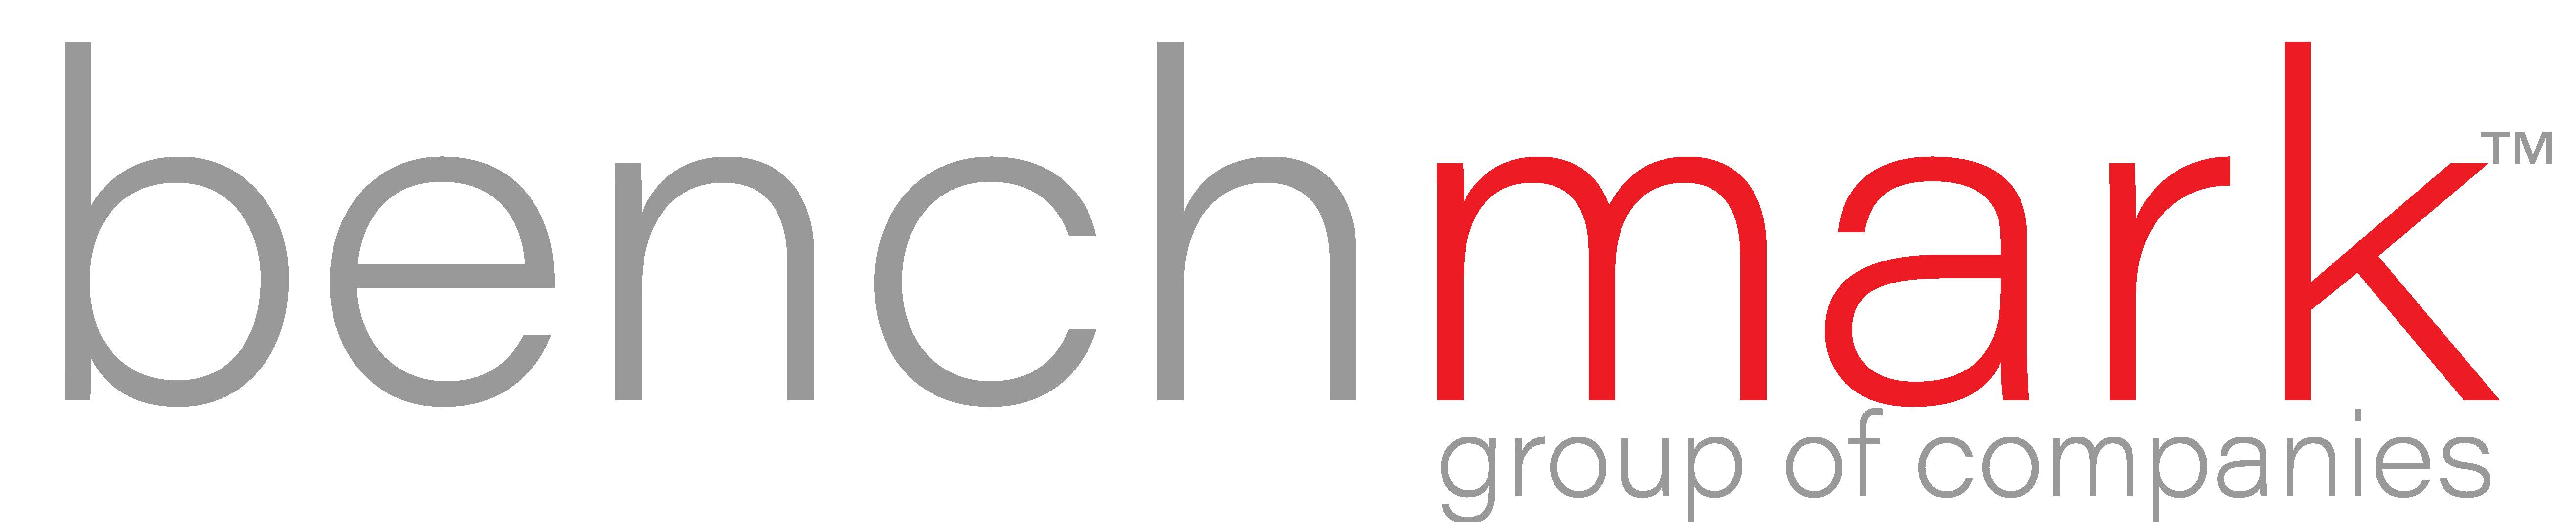 Benchmark Group of Companies